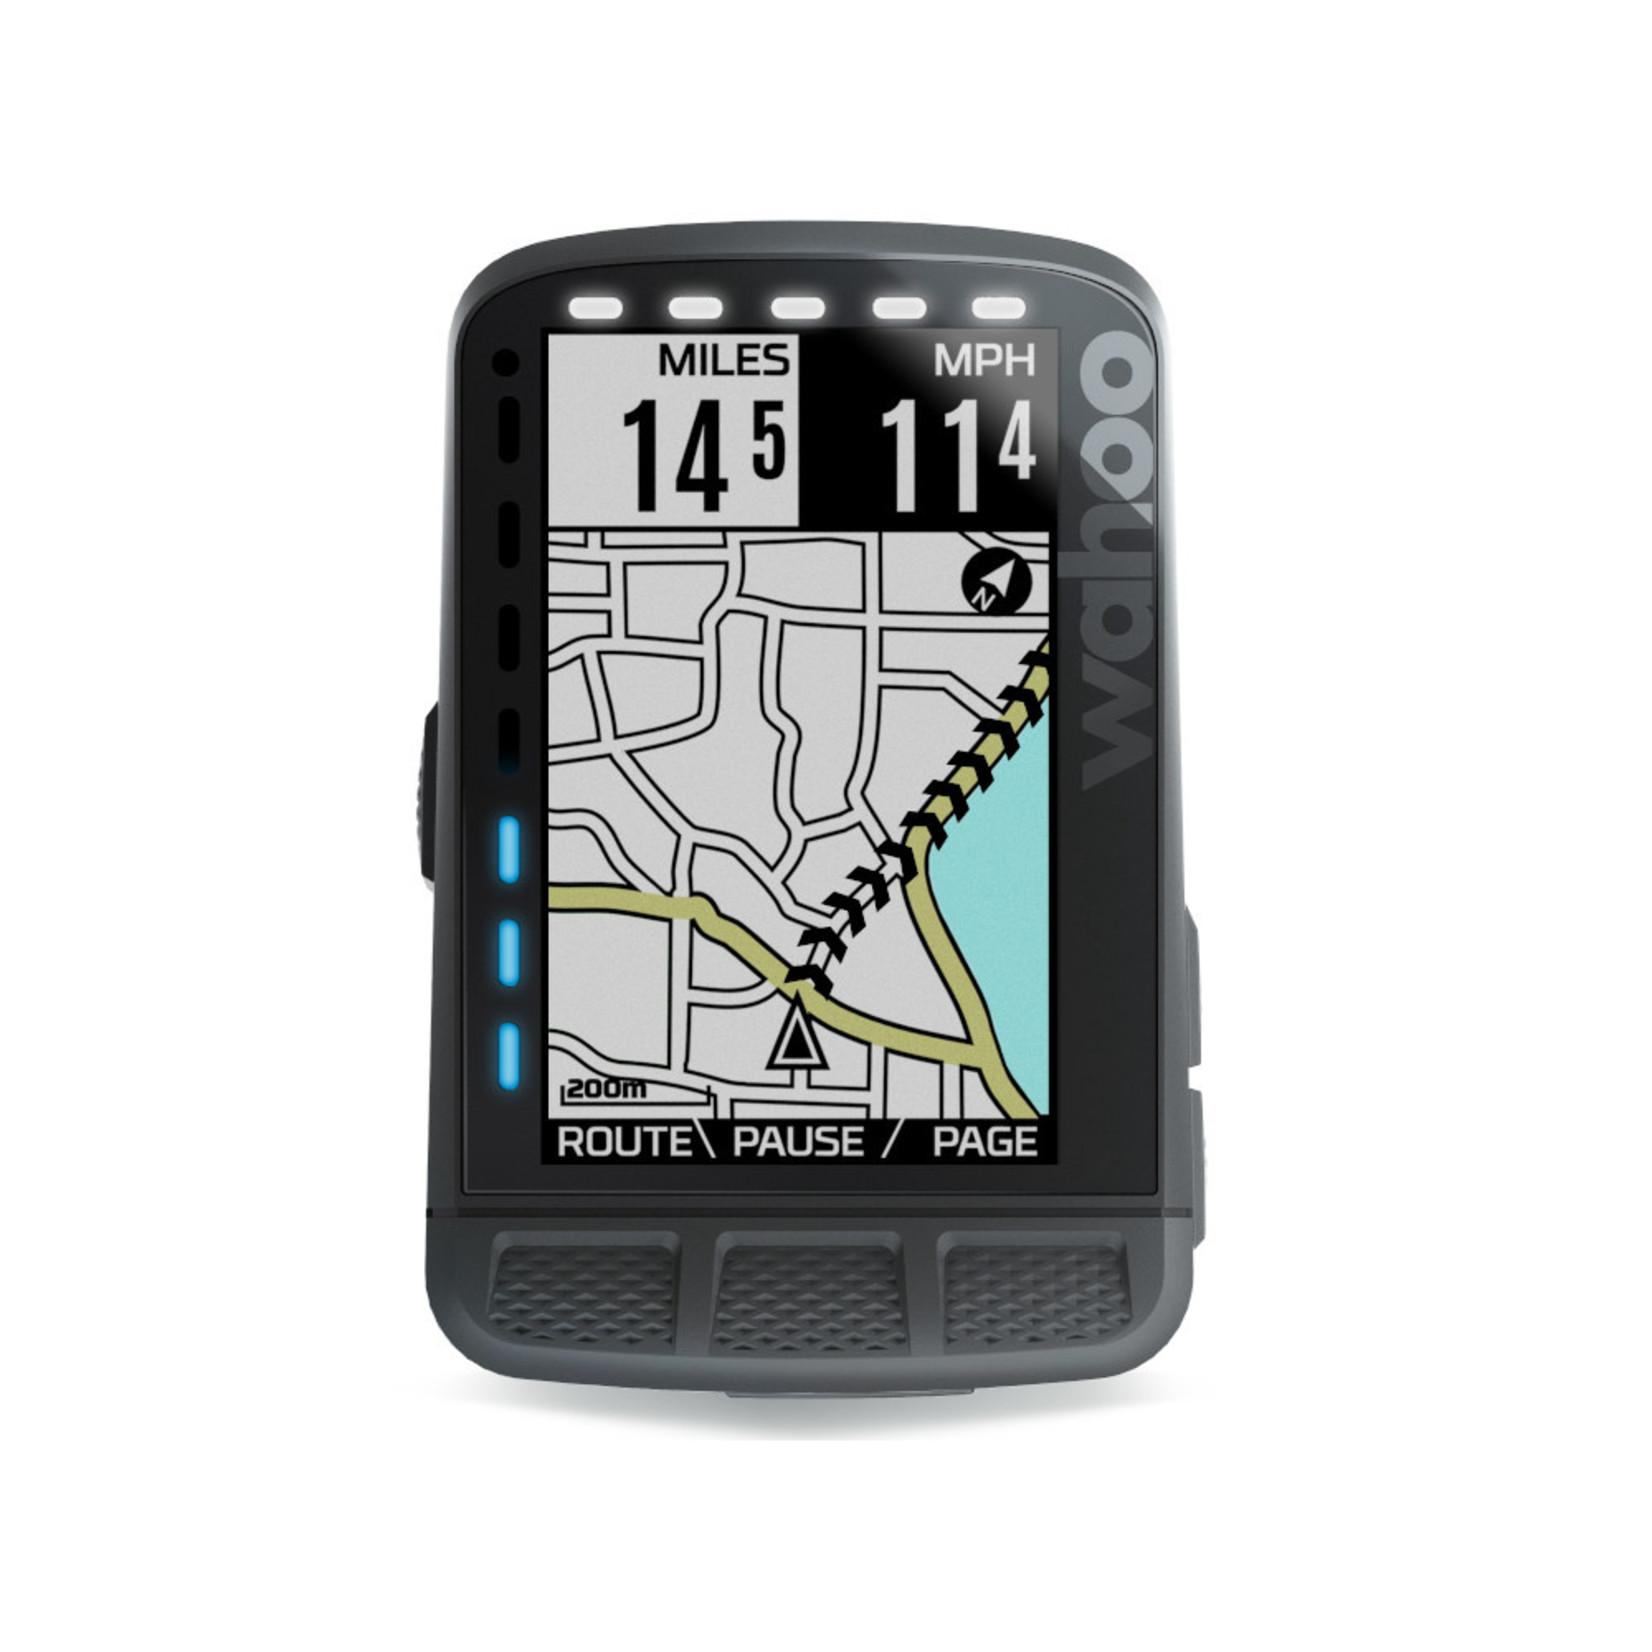 Wahoo WAHOO ELEMENT ROAM GPS BIKE COMPUTER